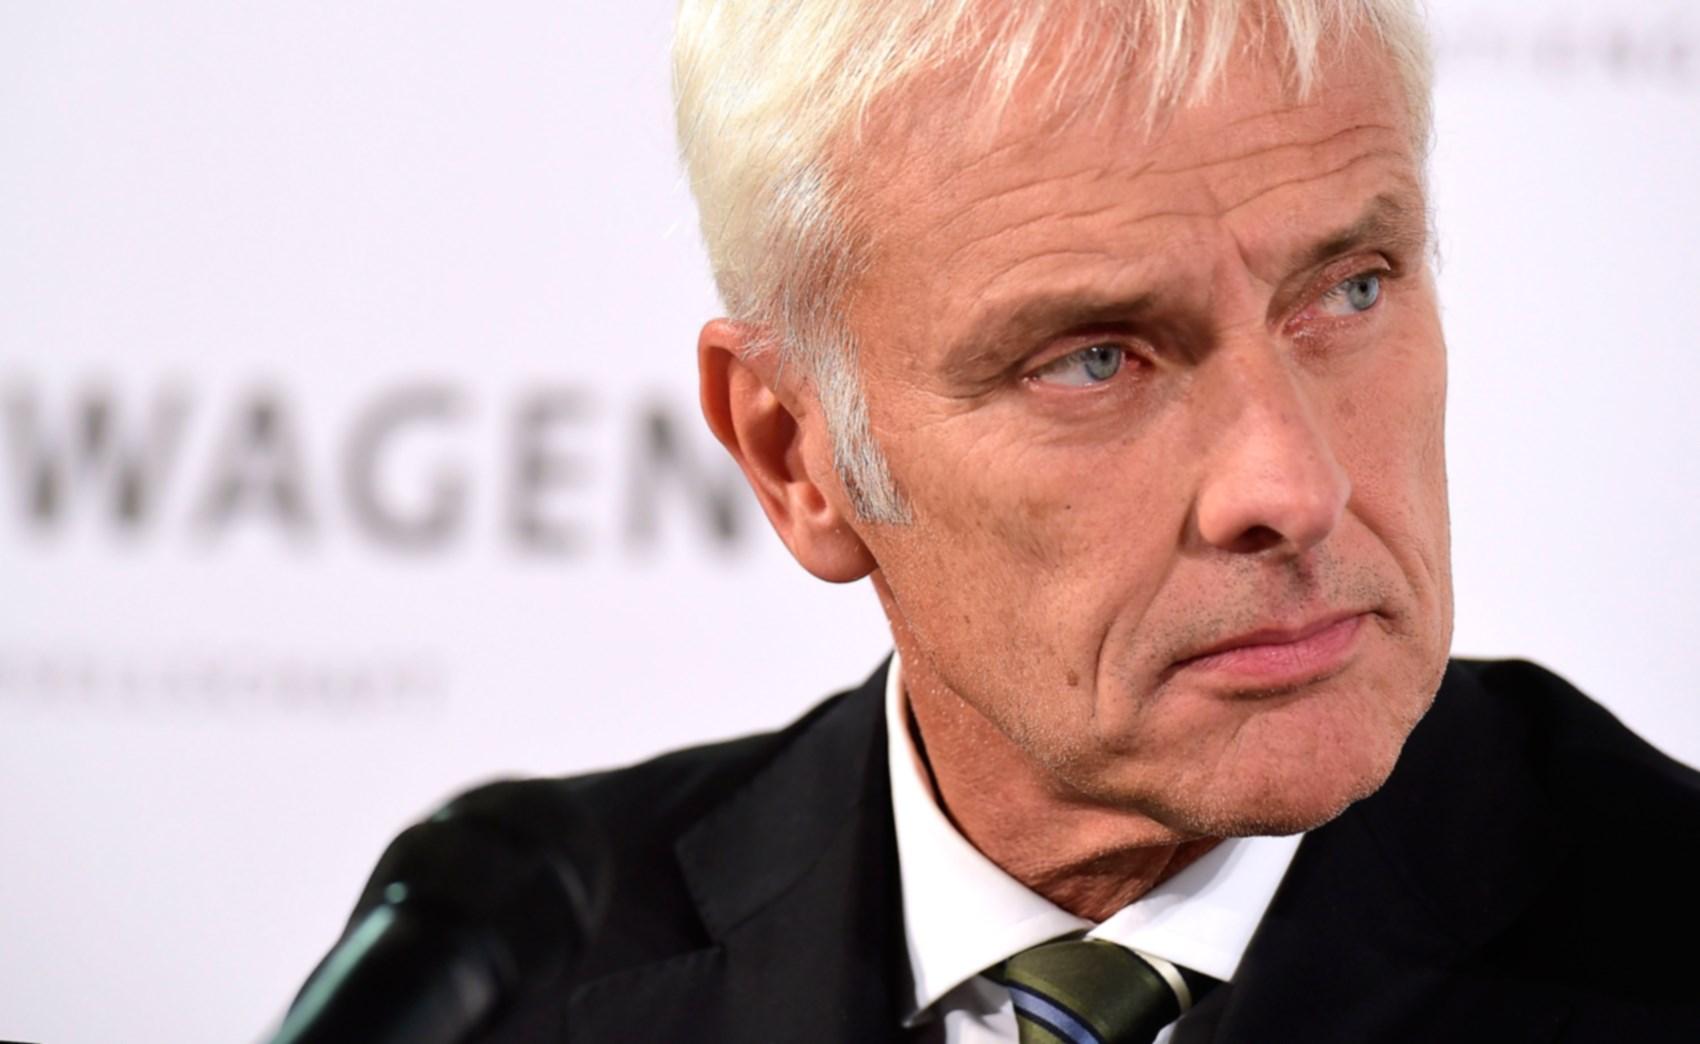 Imagem de É treta? CEO da Volkswagen cutuca a Tesla por perdas financeiras  no tecmundo